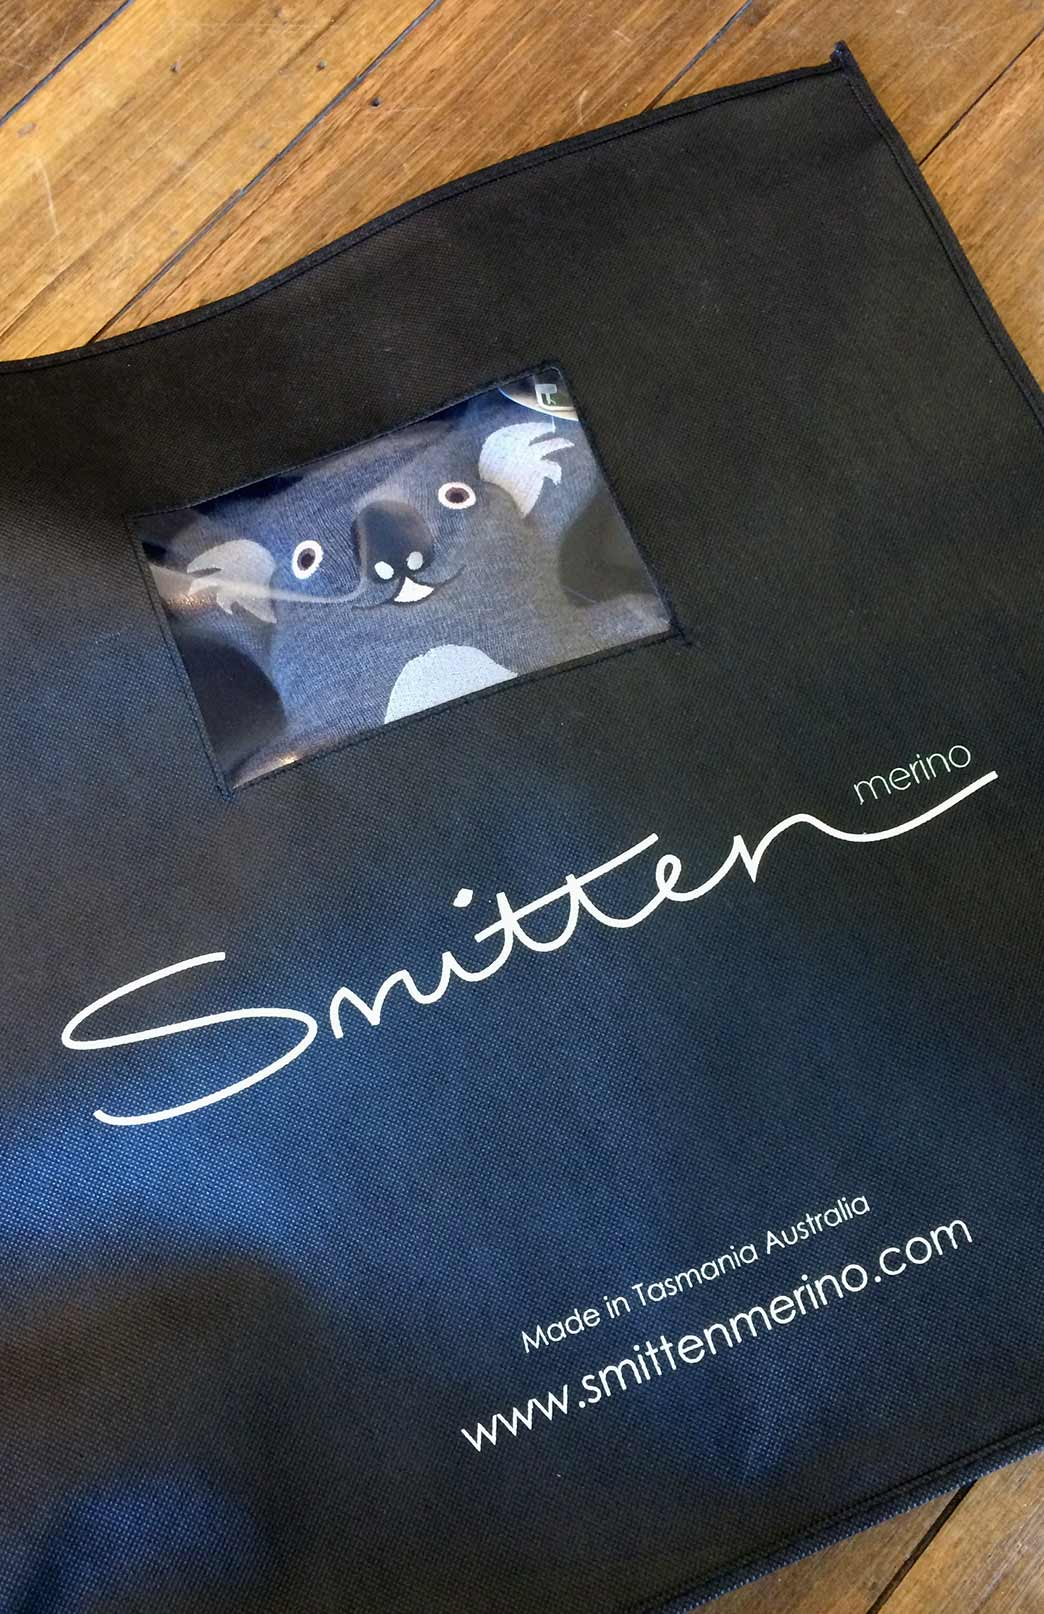 Smitten Garment Bags - Multi Pack - Unique Smitten Merino Branded Garment Protection and Travel Clothing Bags - Smitten Merino Tasmania Australia